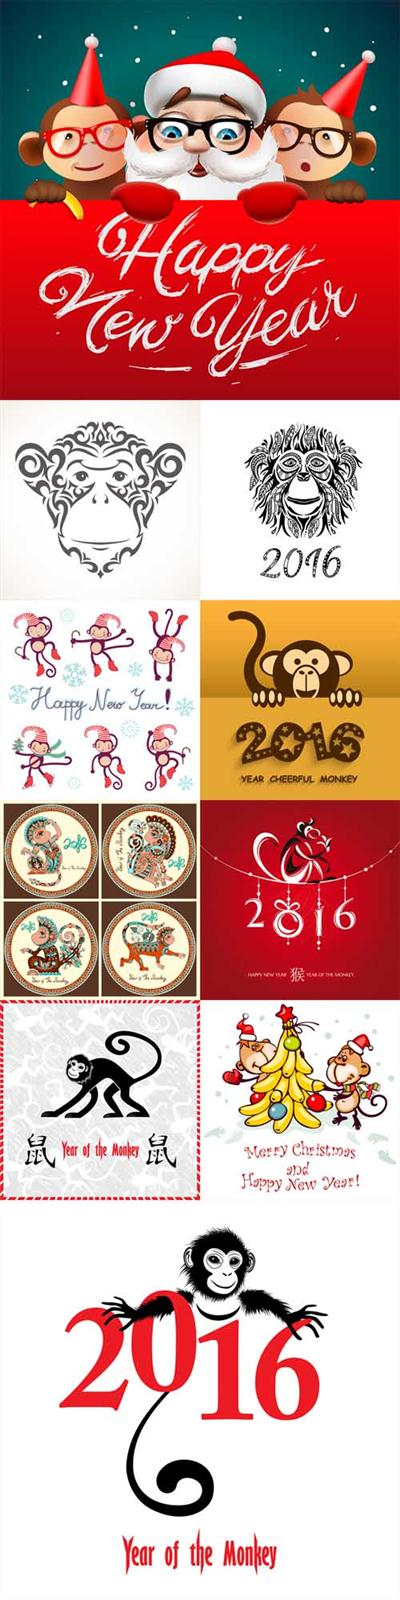 http://i2.wp.com/i74.fastpic.ru/big/2015/1127/35/e341d90ce7110ef7365a915814f65335.jpg